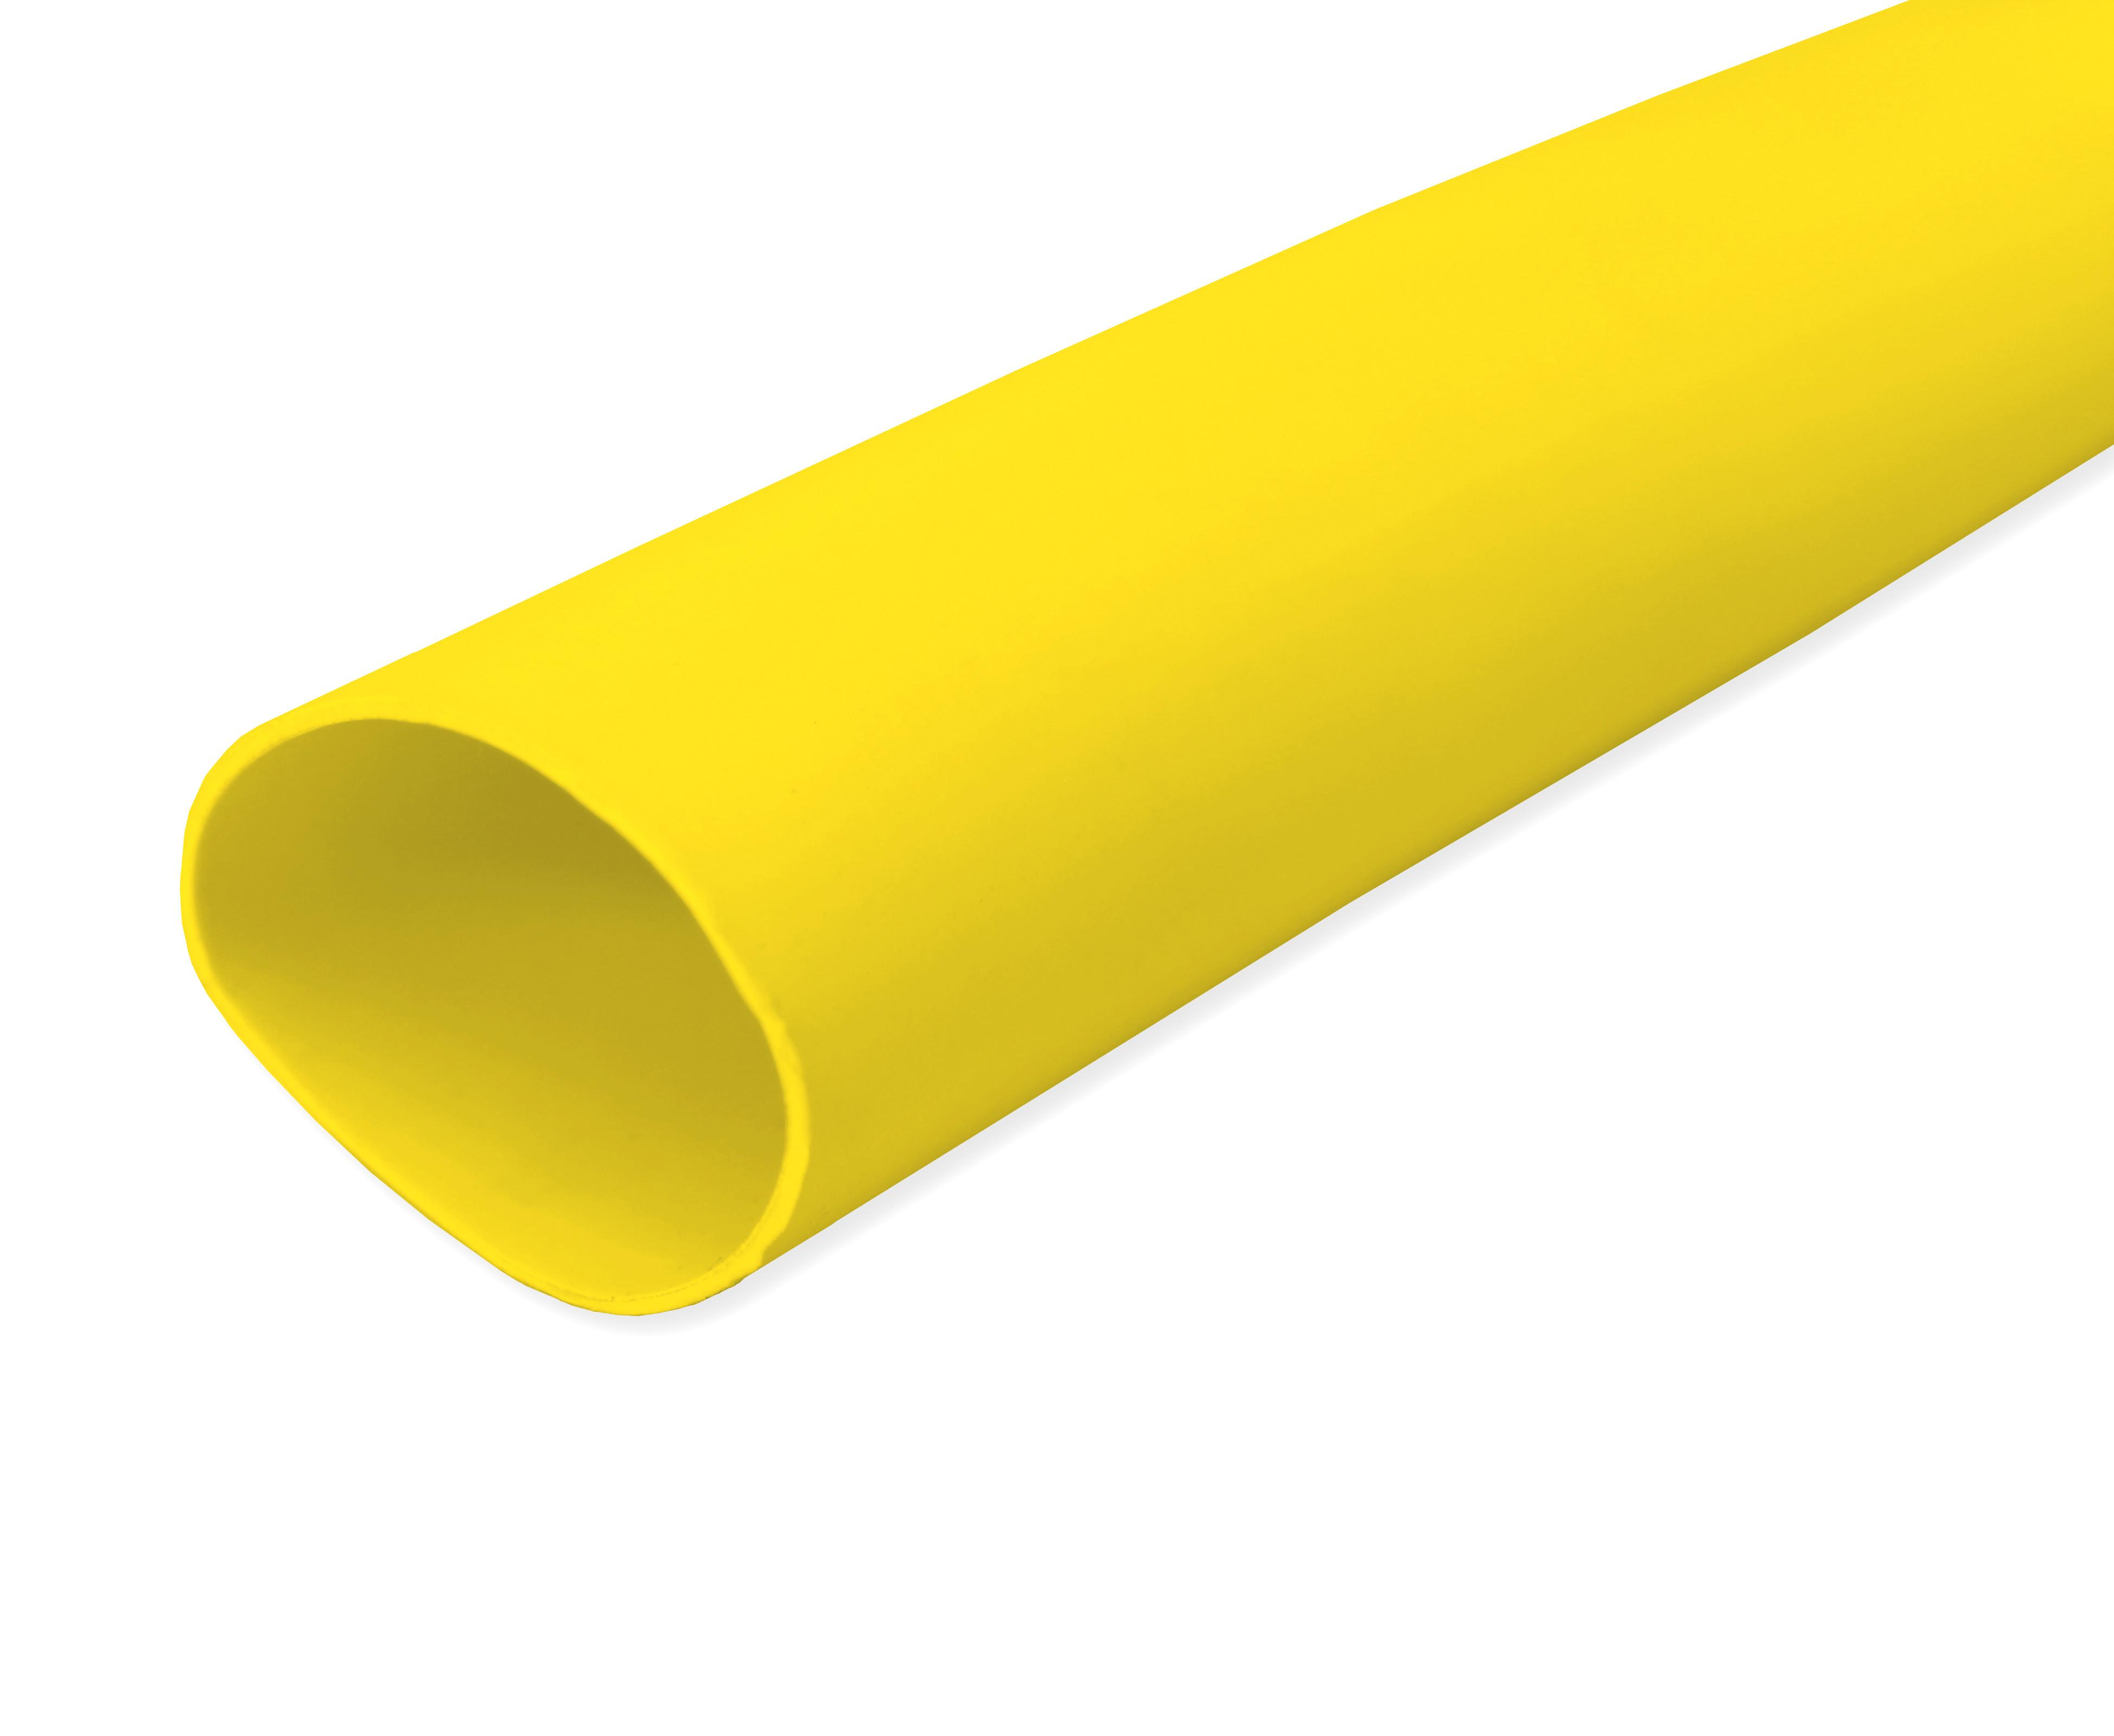 Yellow PVC Sleeving 20.0mm